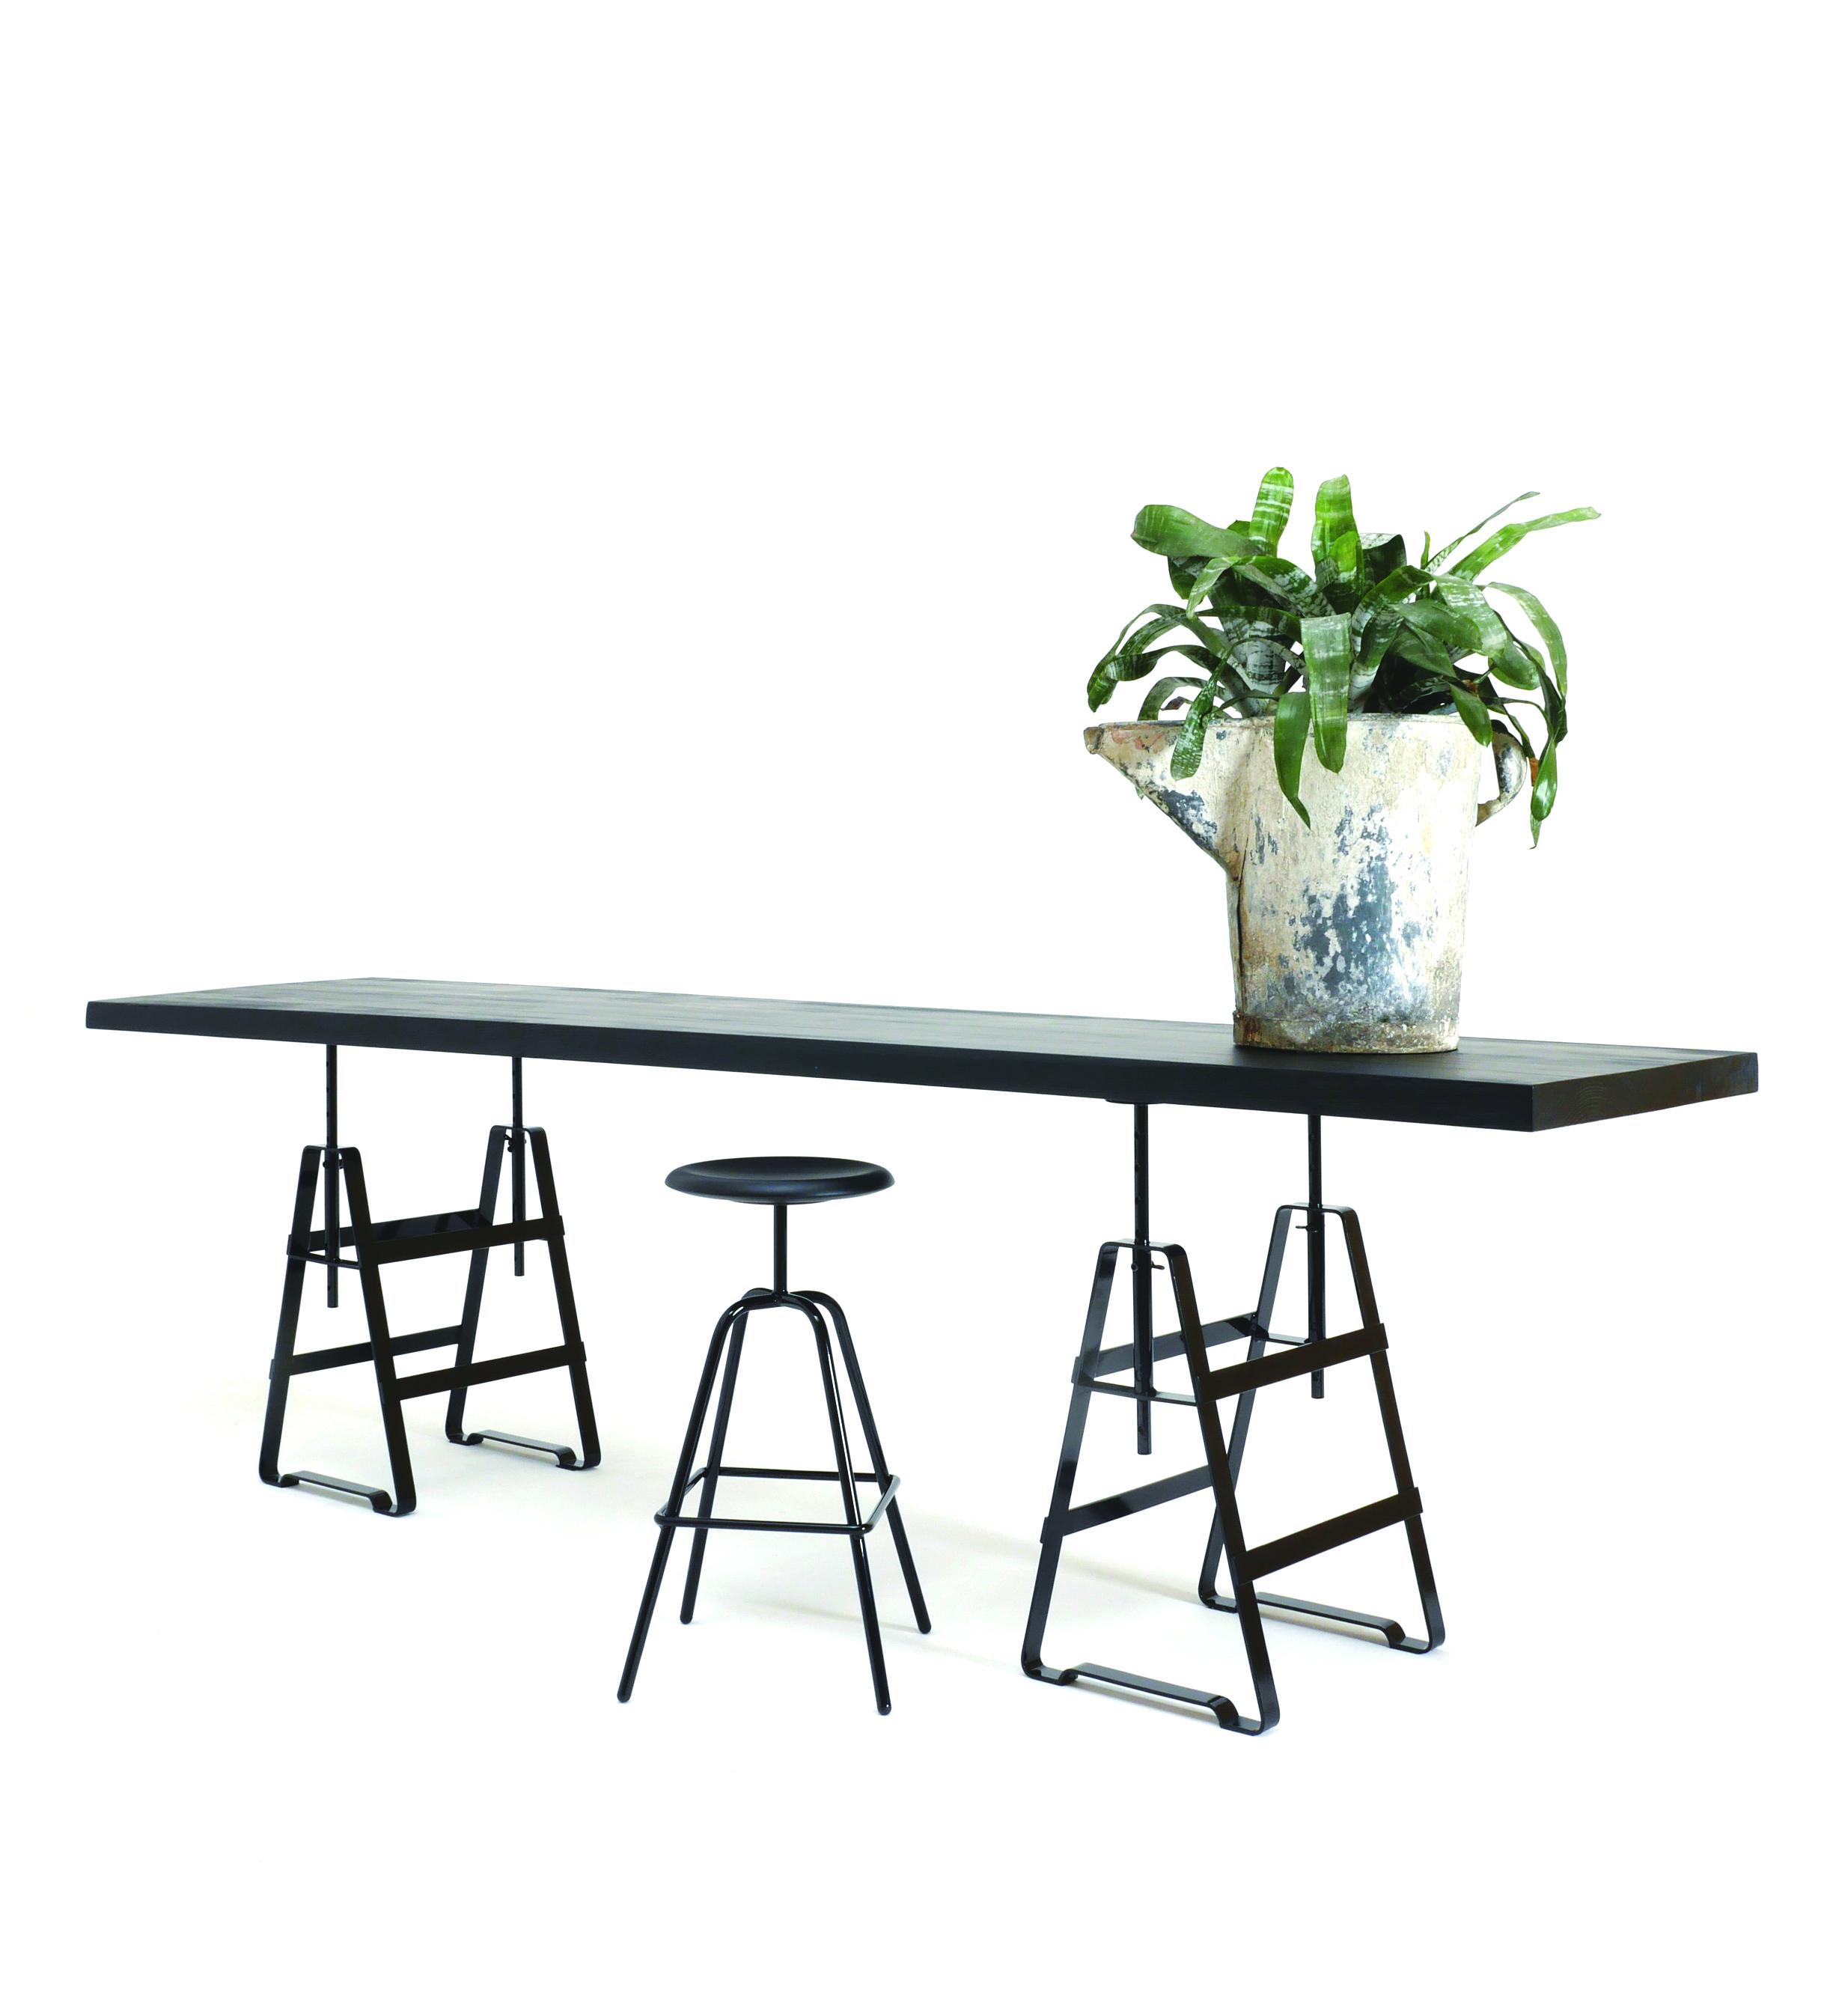 Lackaffe Tischbock Tischgestell Stahl Herrenberger Hocker Atelier Haußmann